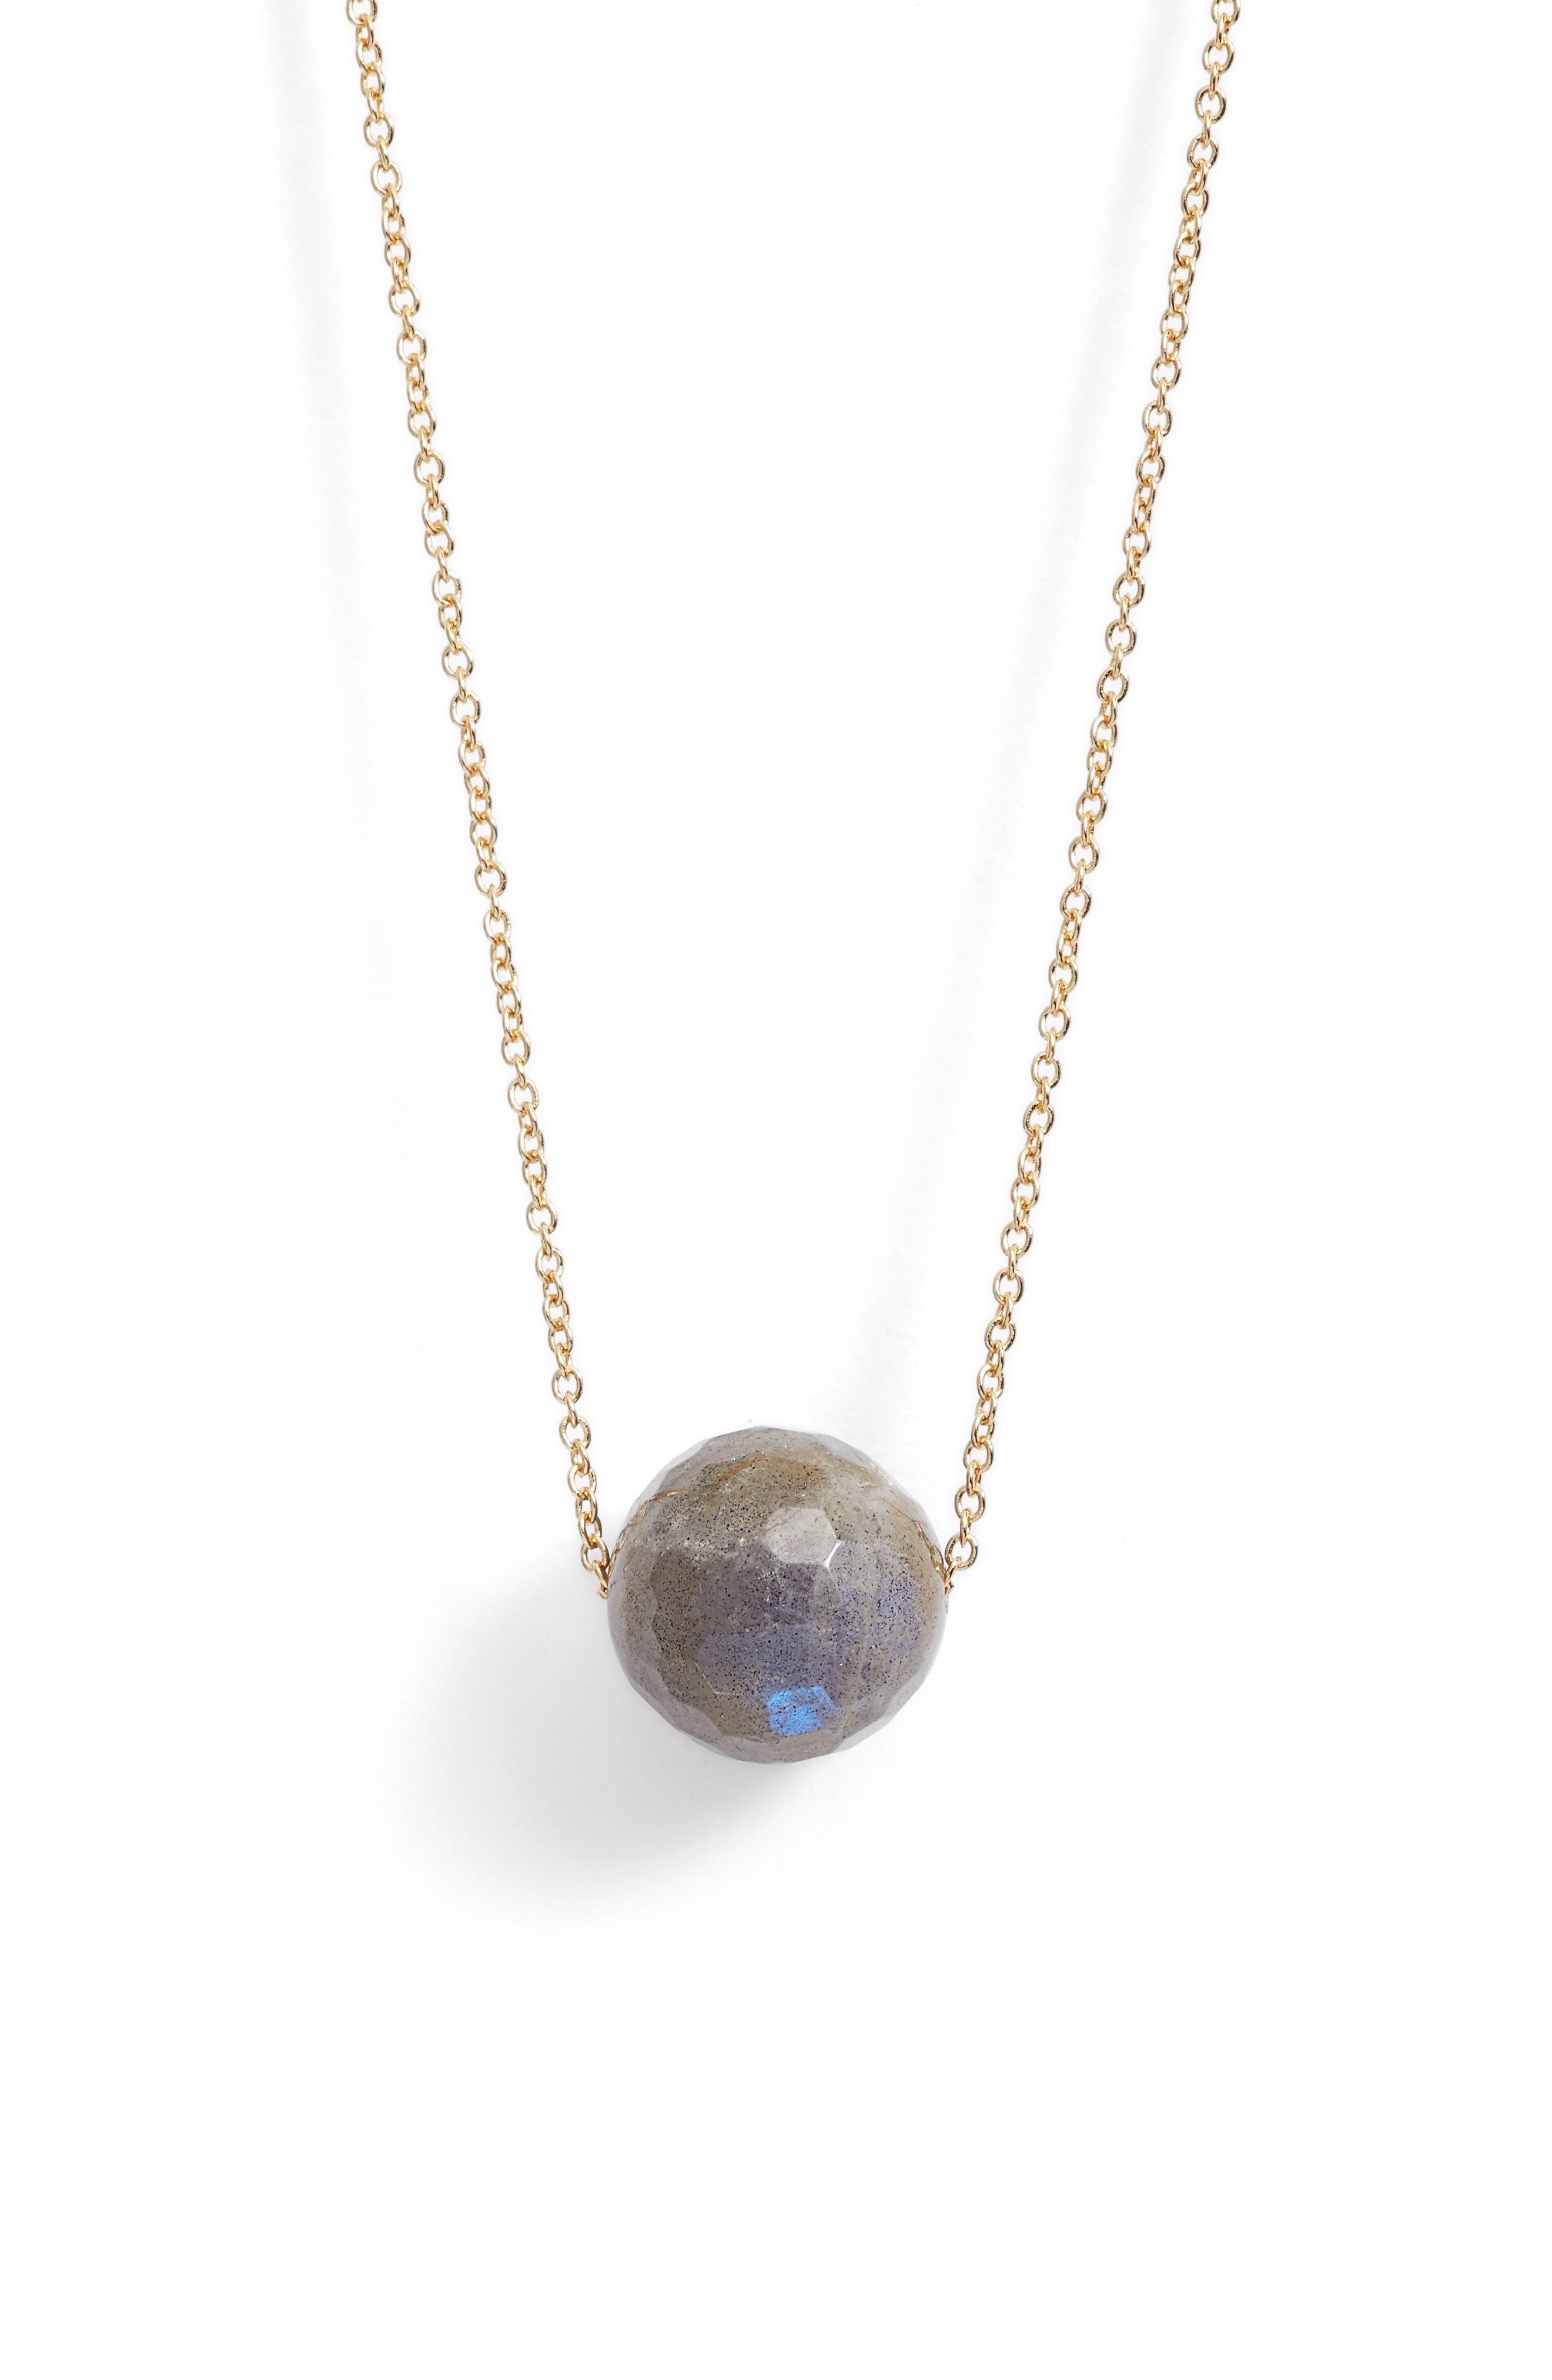 Power Gemstone Bead Adjustable Necklace,                             Main thumbnail 1, color,                             Labradorite/ Gold